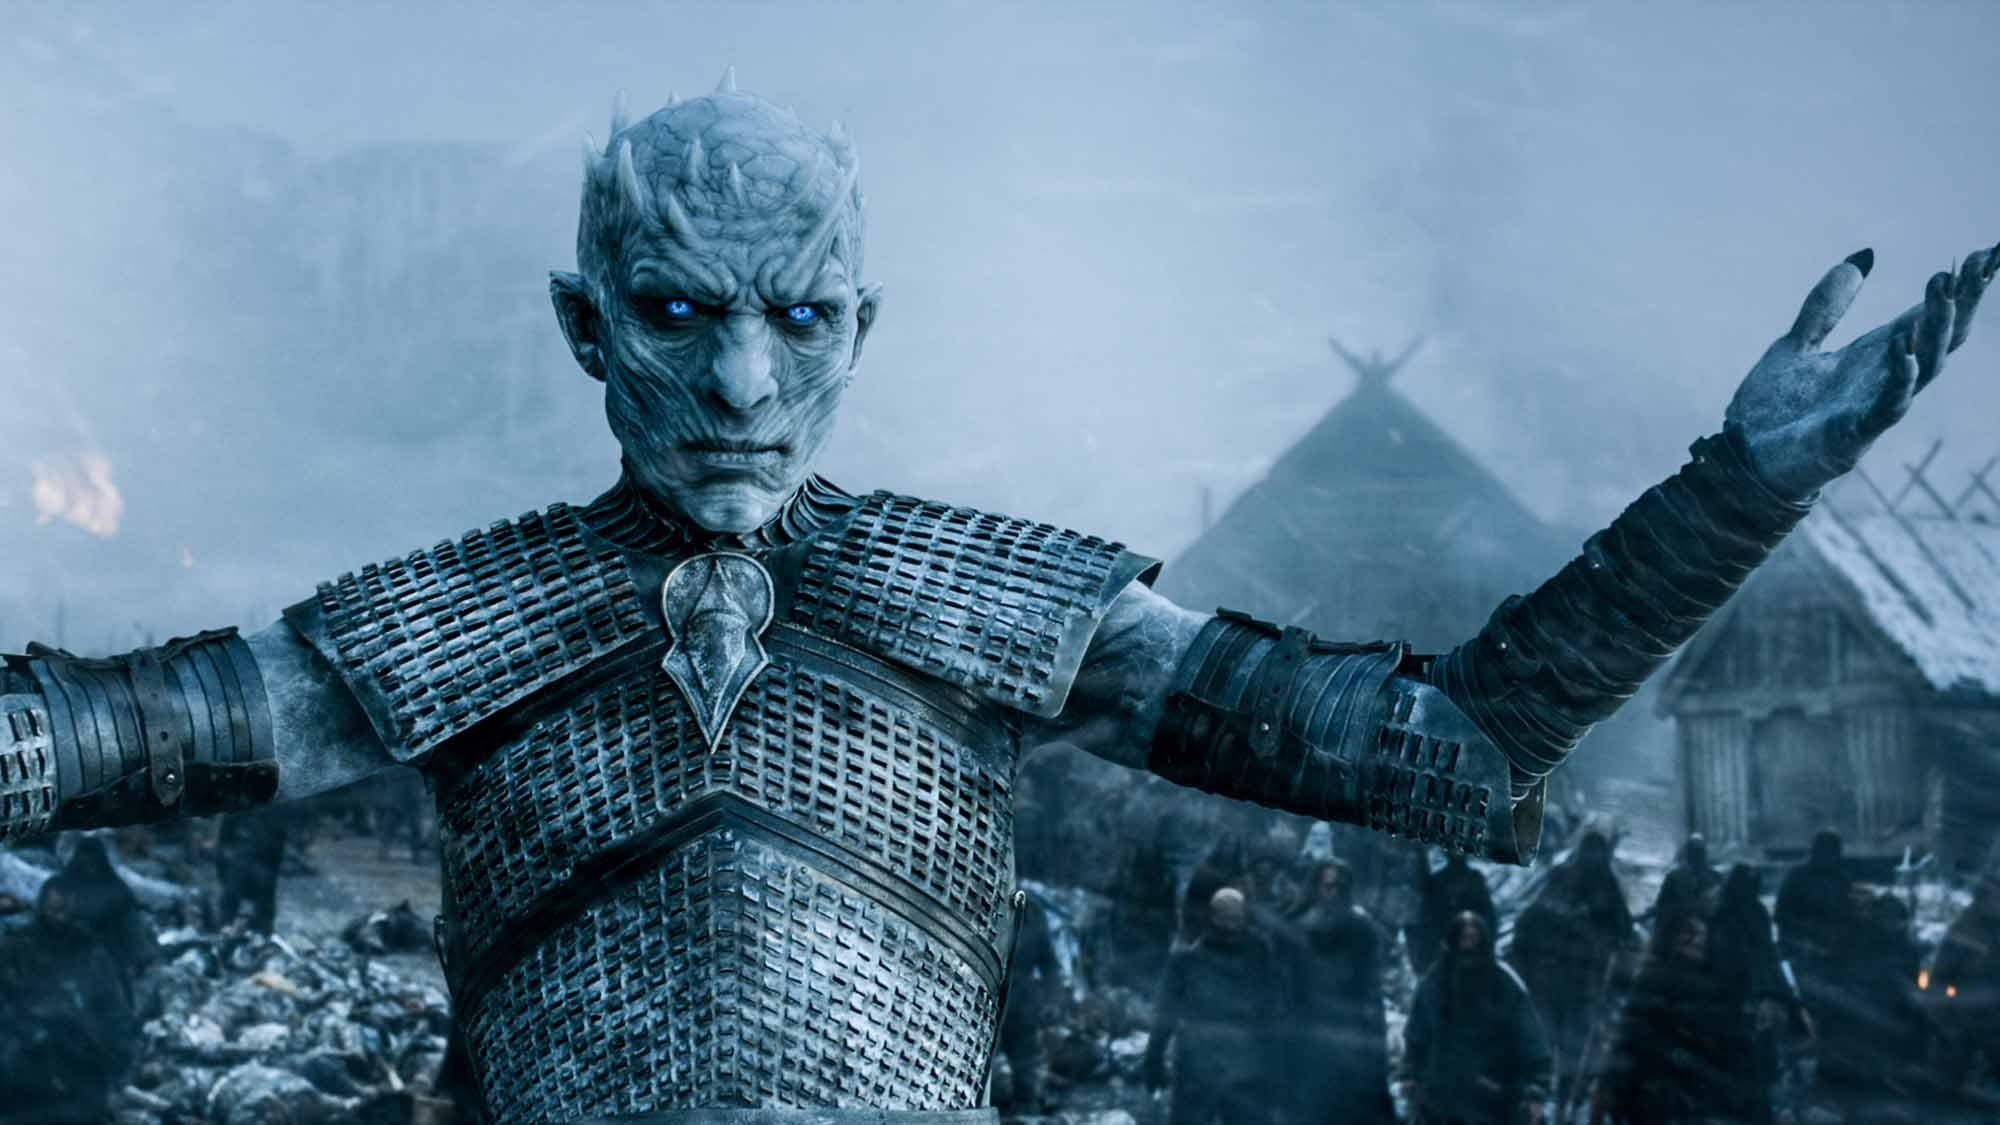 https://cinemaplanet.pt/wp-content/uploads/2016/12/Game-of-Thrones.jpg